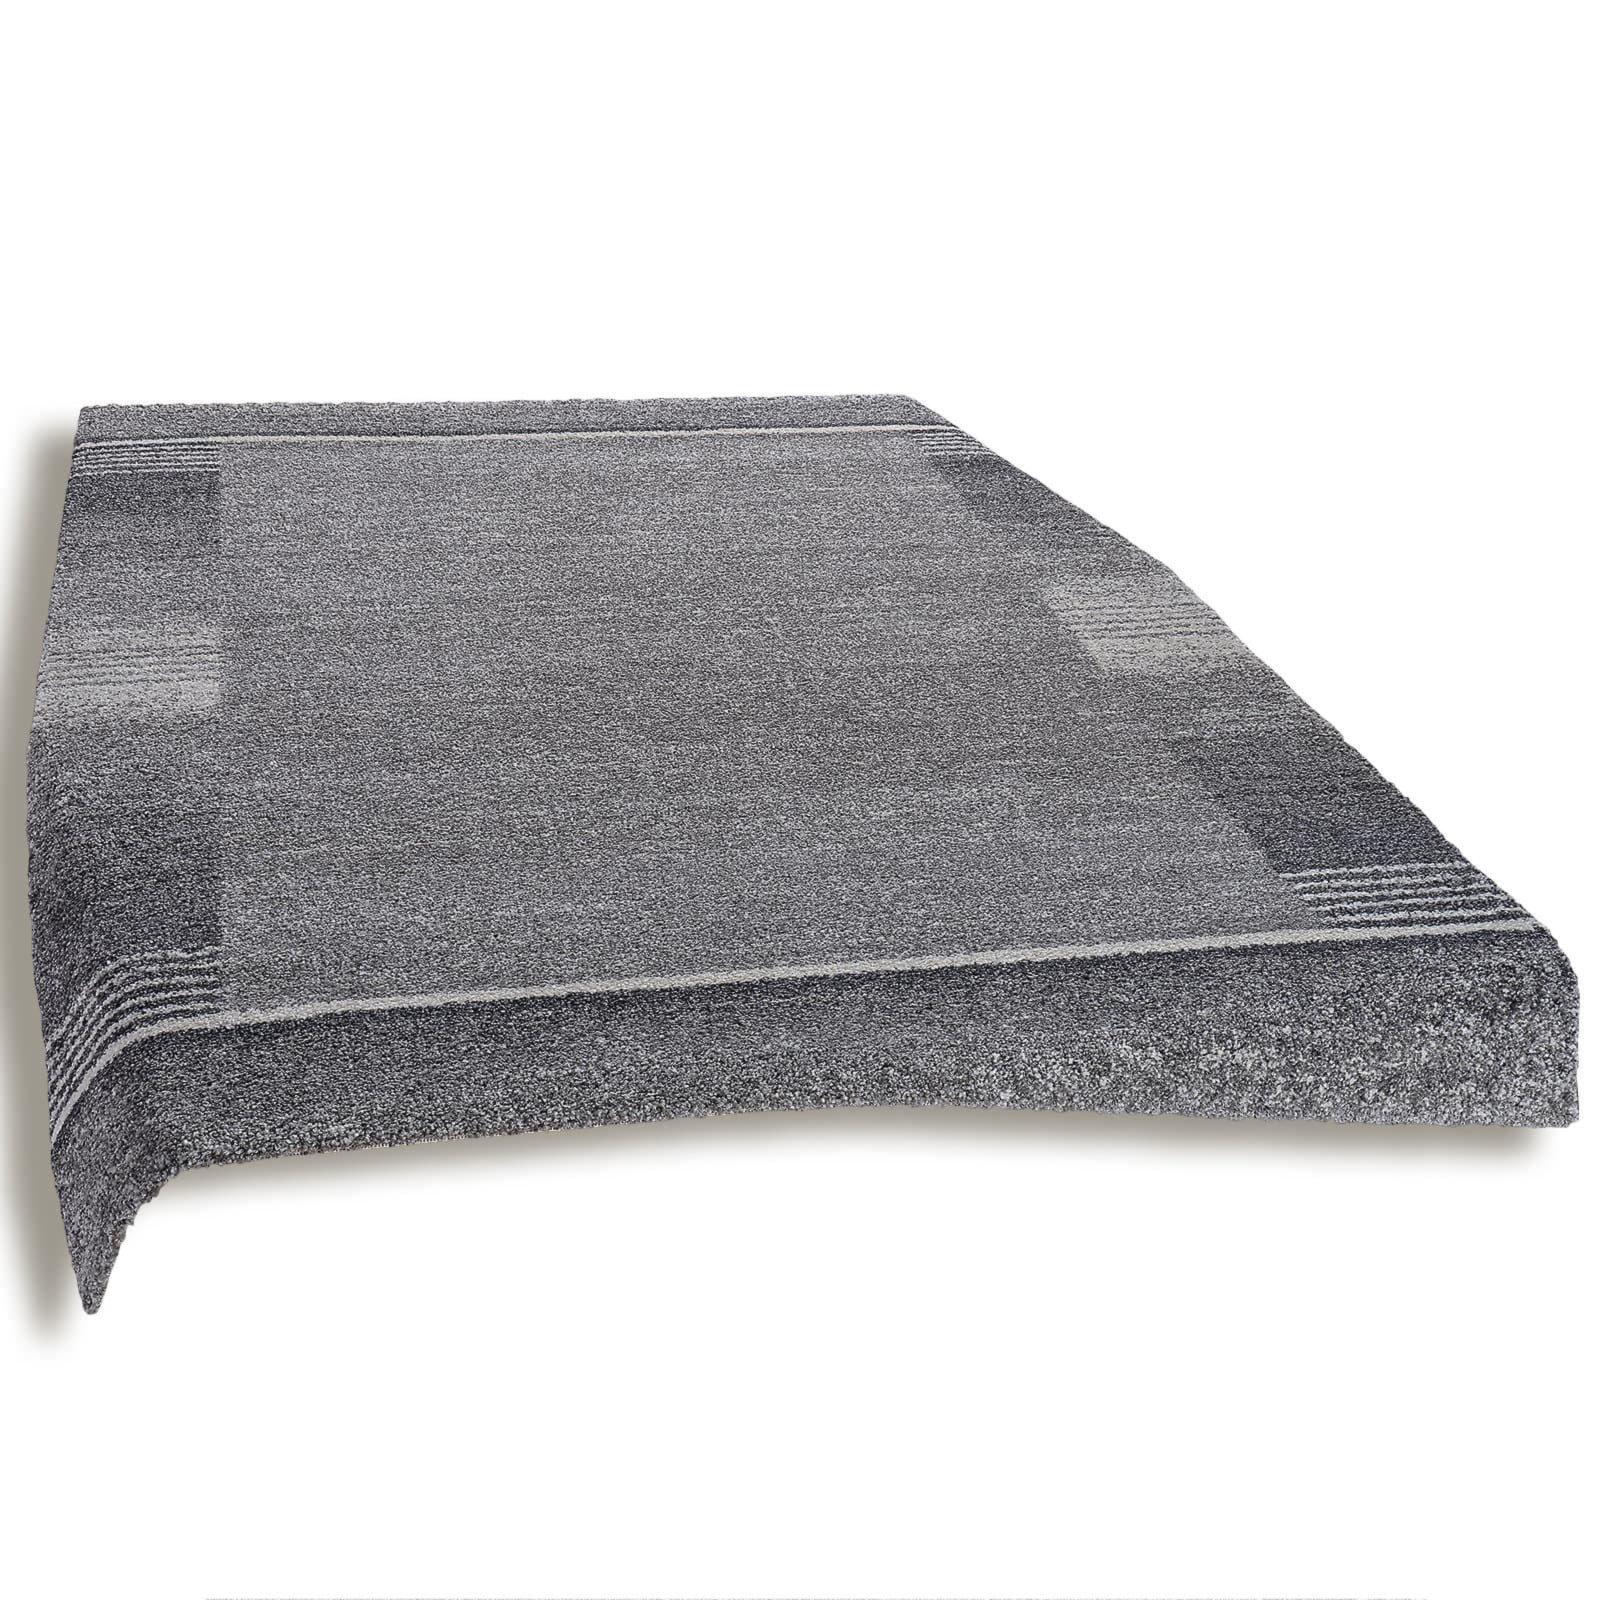 teppich wien dunkelgrau 160x230 cm gemusterte. Black Bedroom Furniture Sets. Home Design Ideas